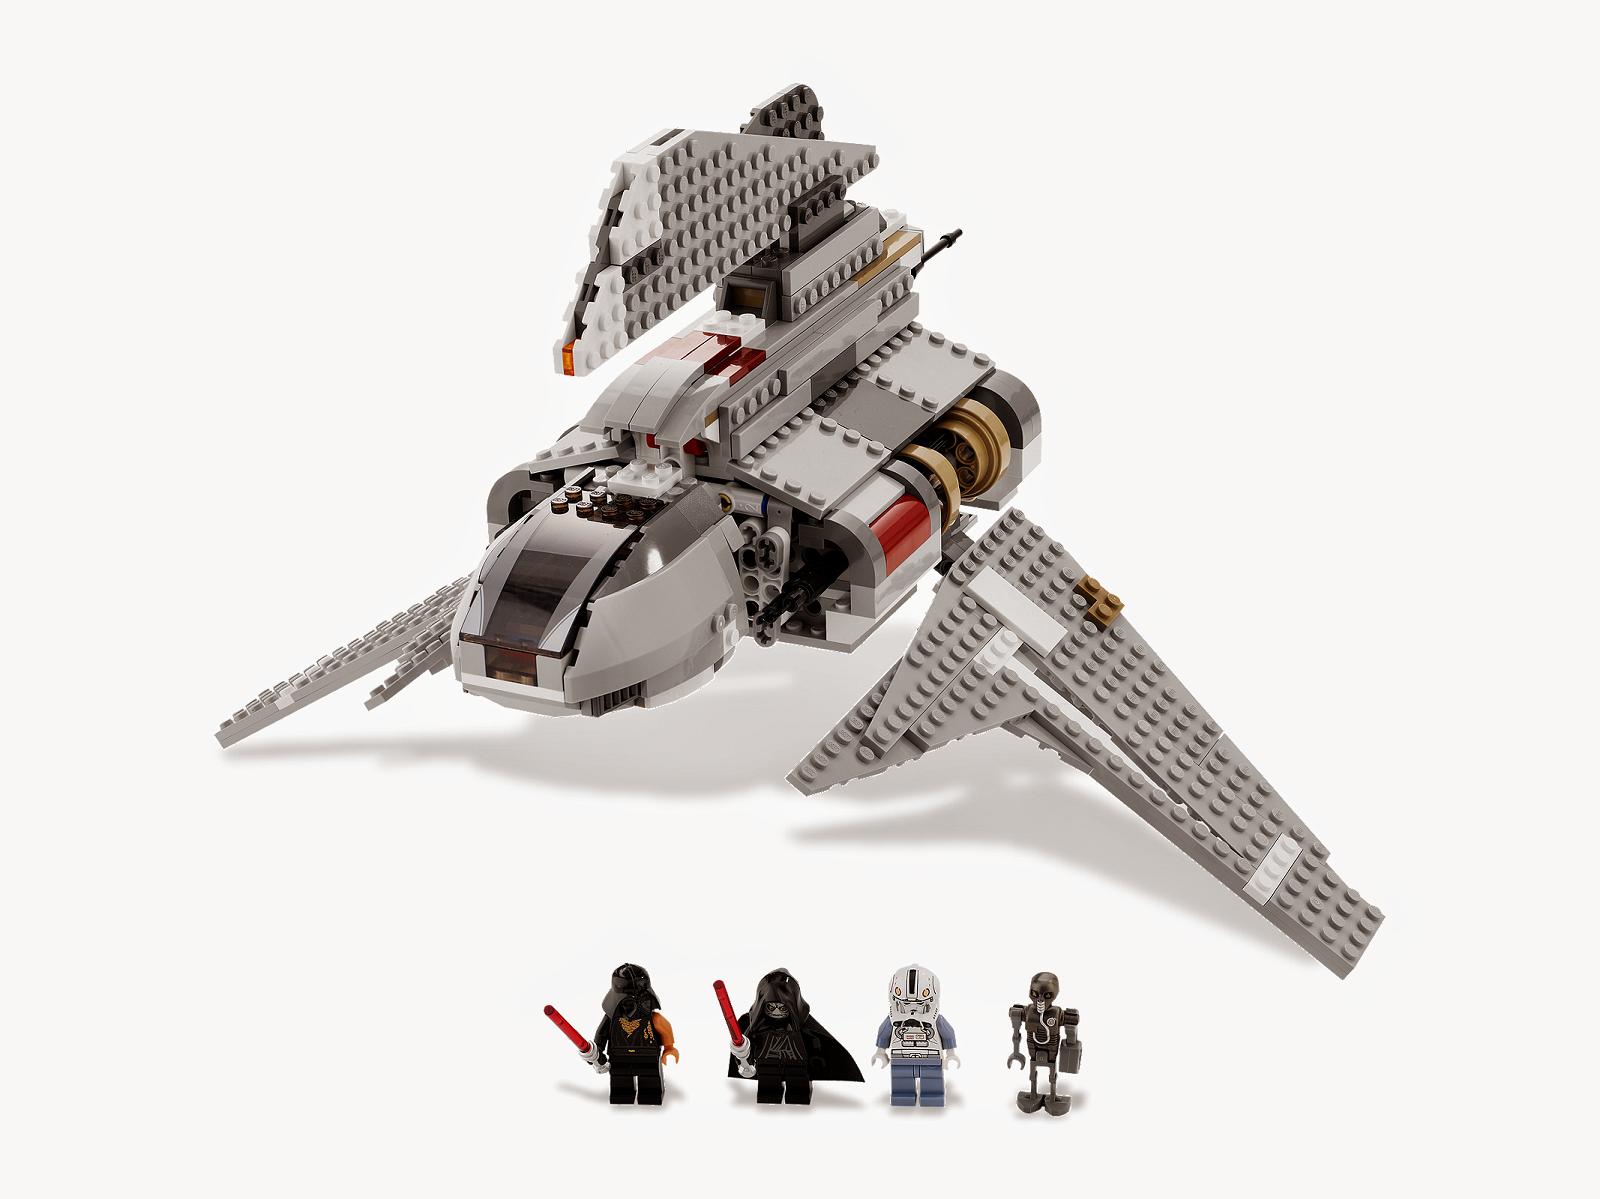 Lego 8096 Star Wars Emperor Palpatine Shuttle complet 100 % de 2010 CG7